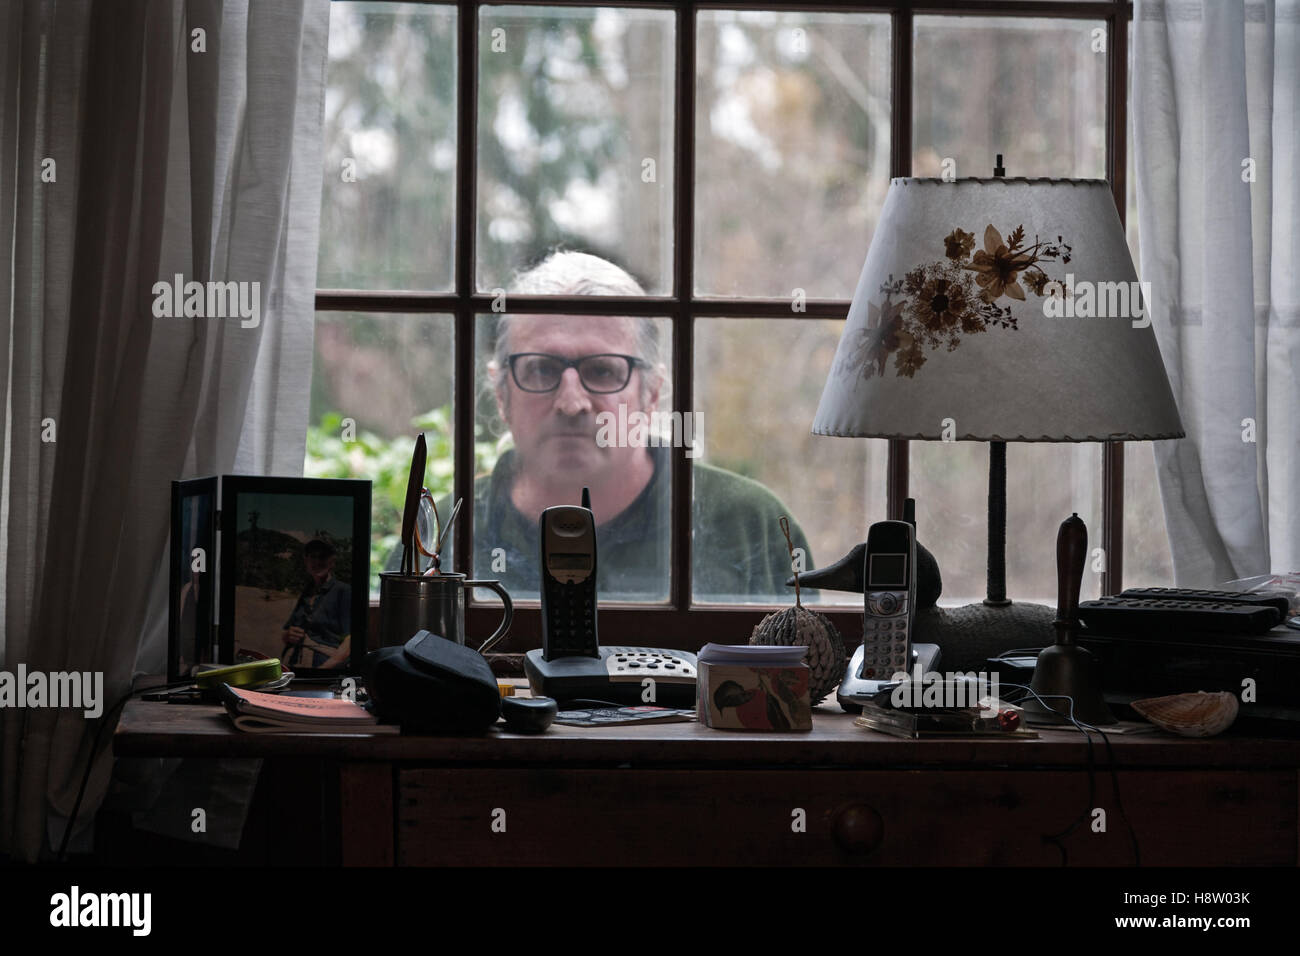 Mid-Adult Man Peering through House Window - Stock Image